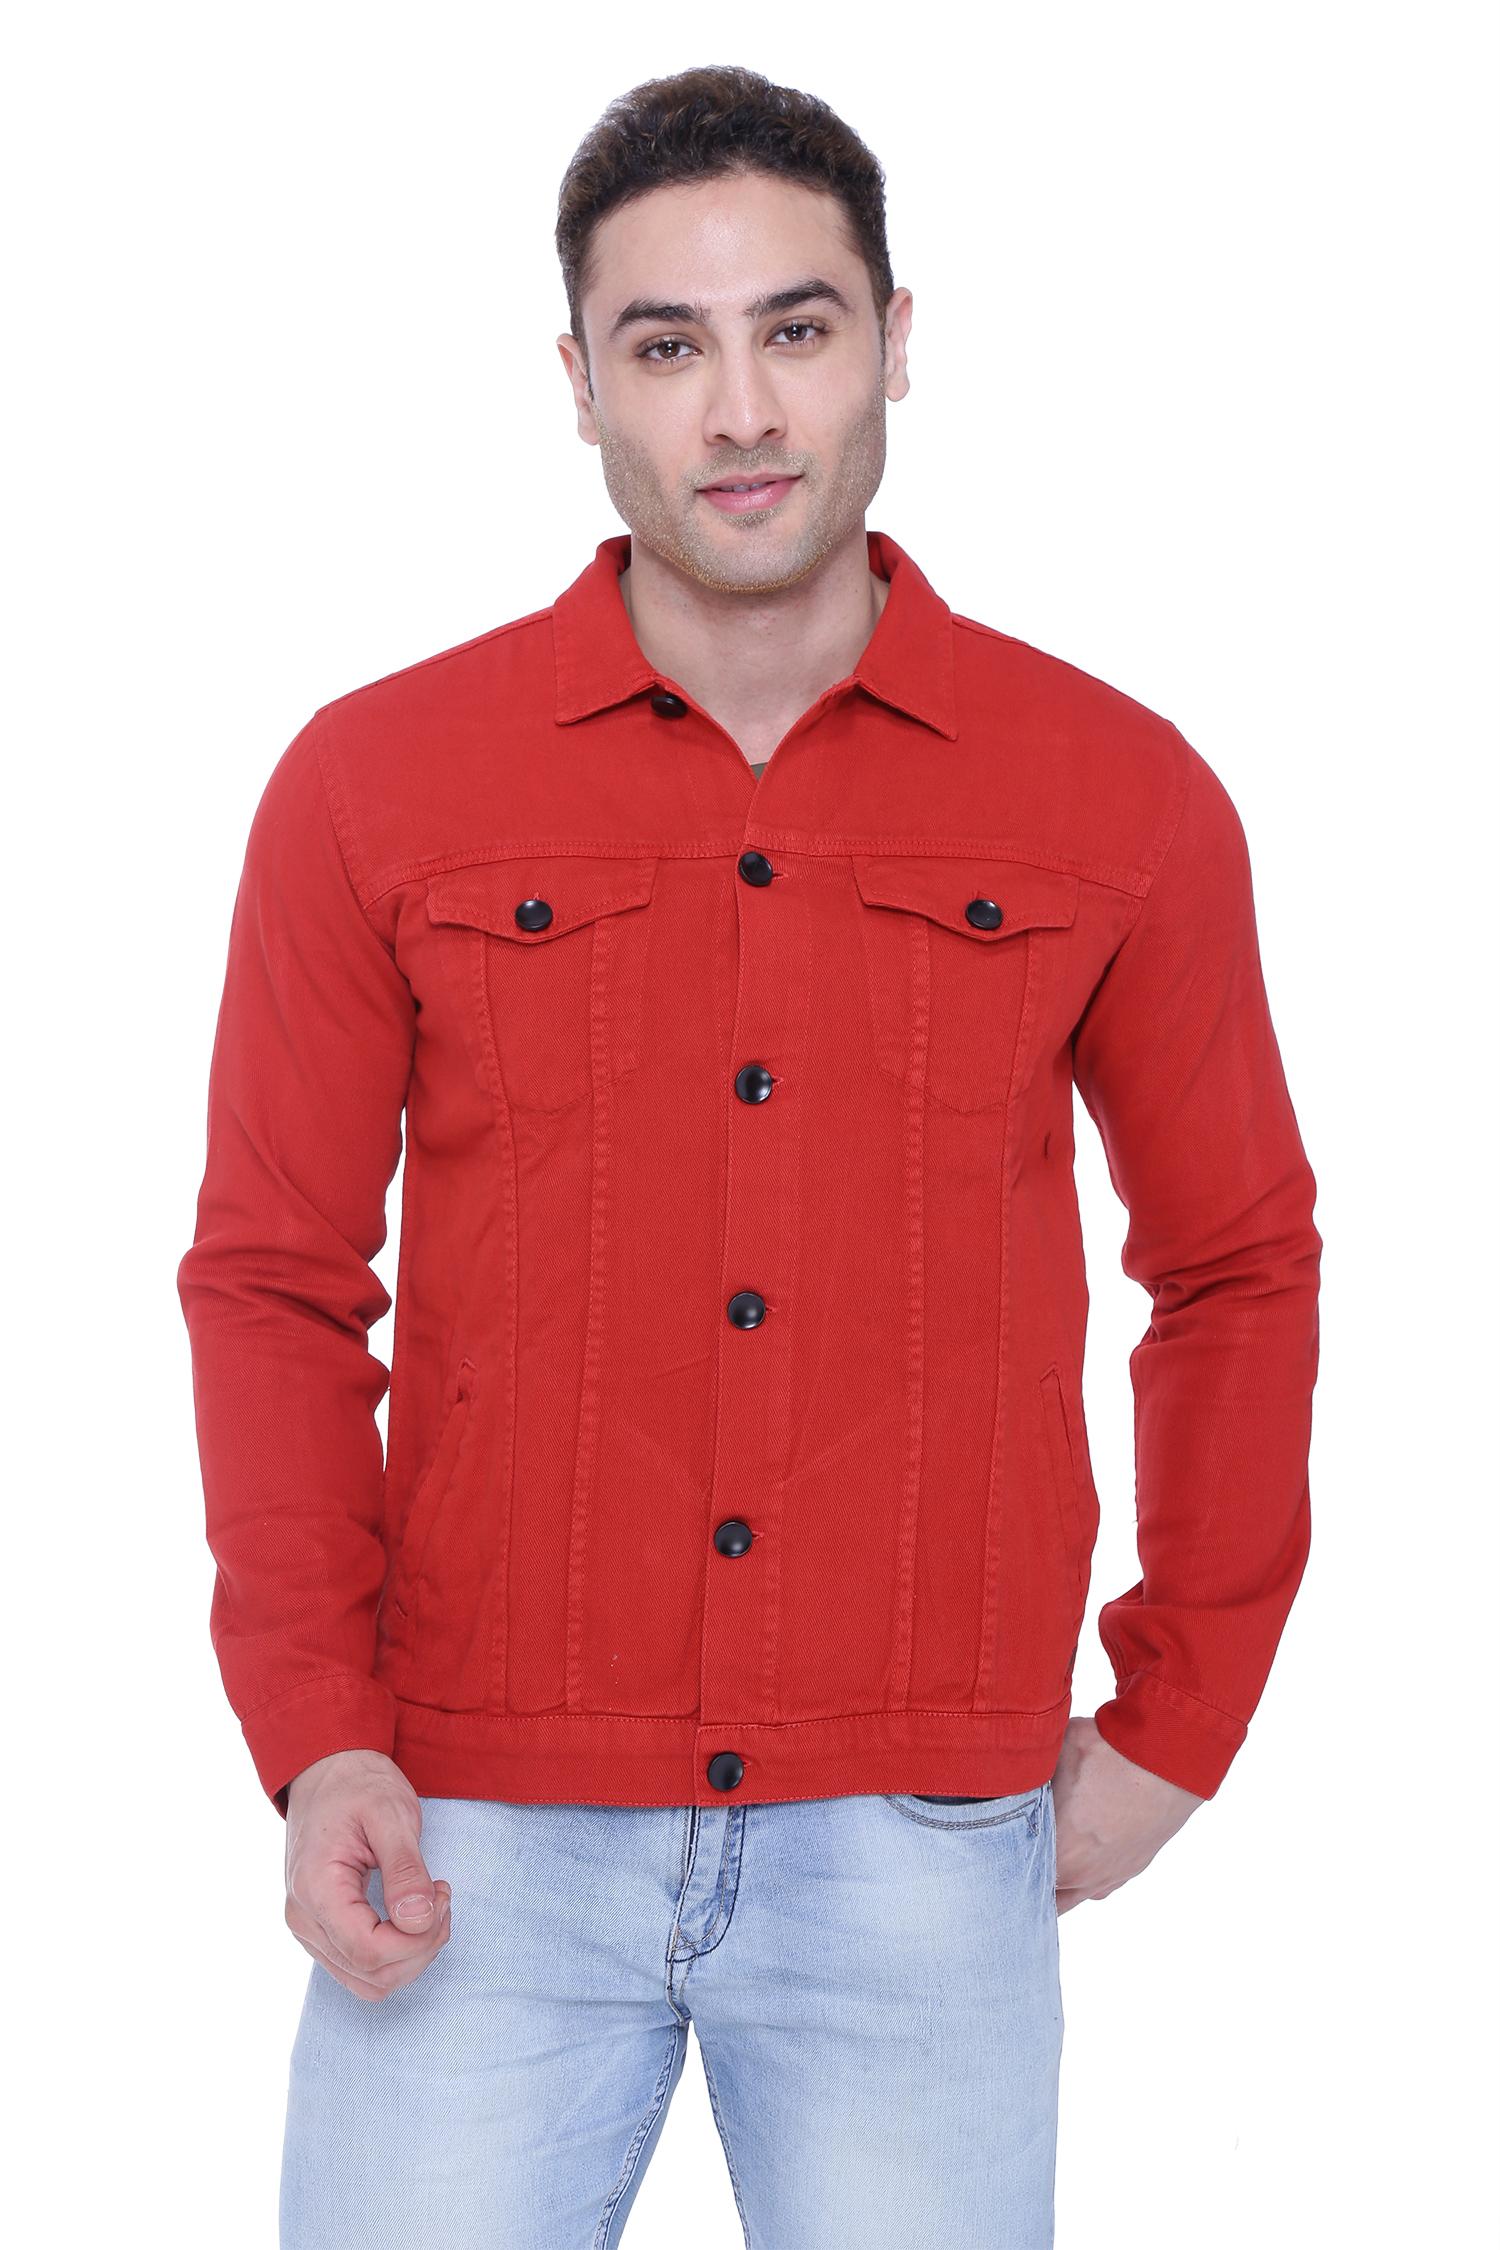 Kuons Avenue | Kuons Avenue Men's Cherry Red Denim Jacket- KACLFS1361RD